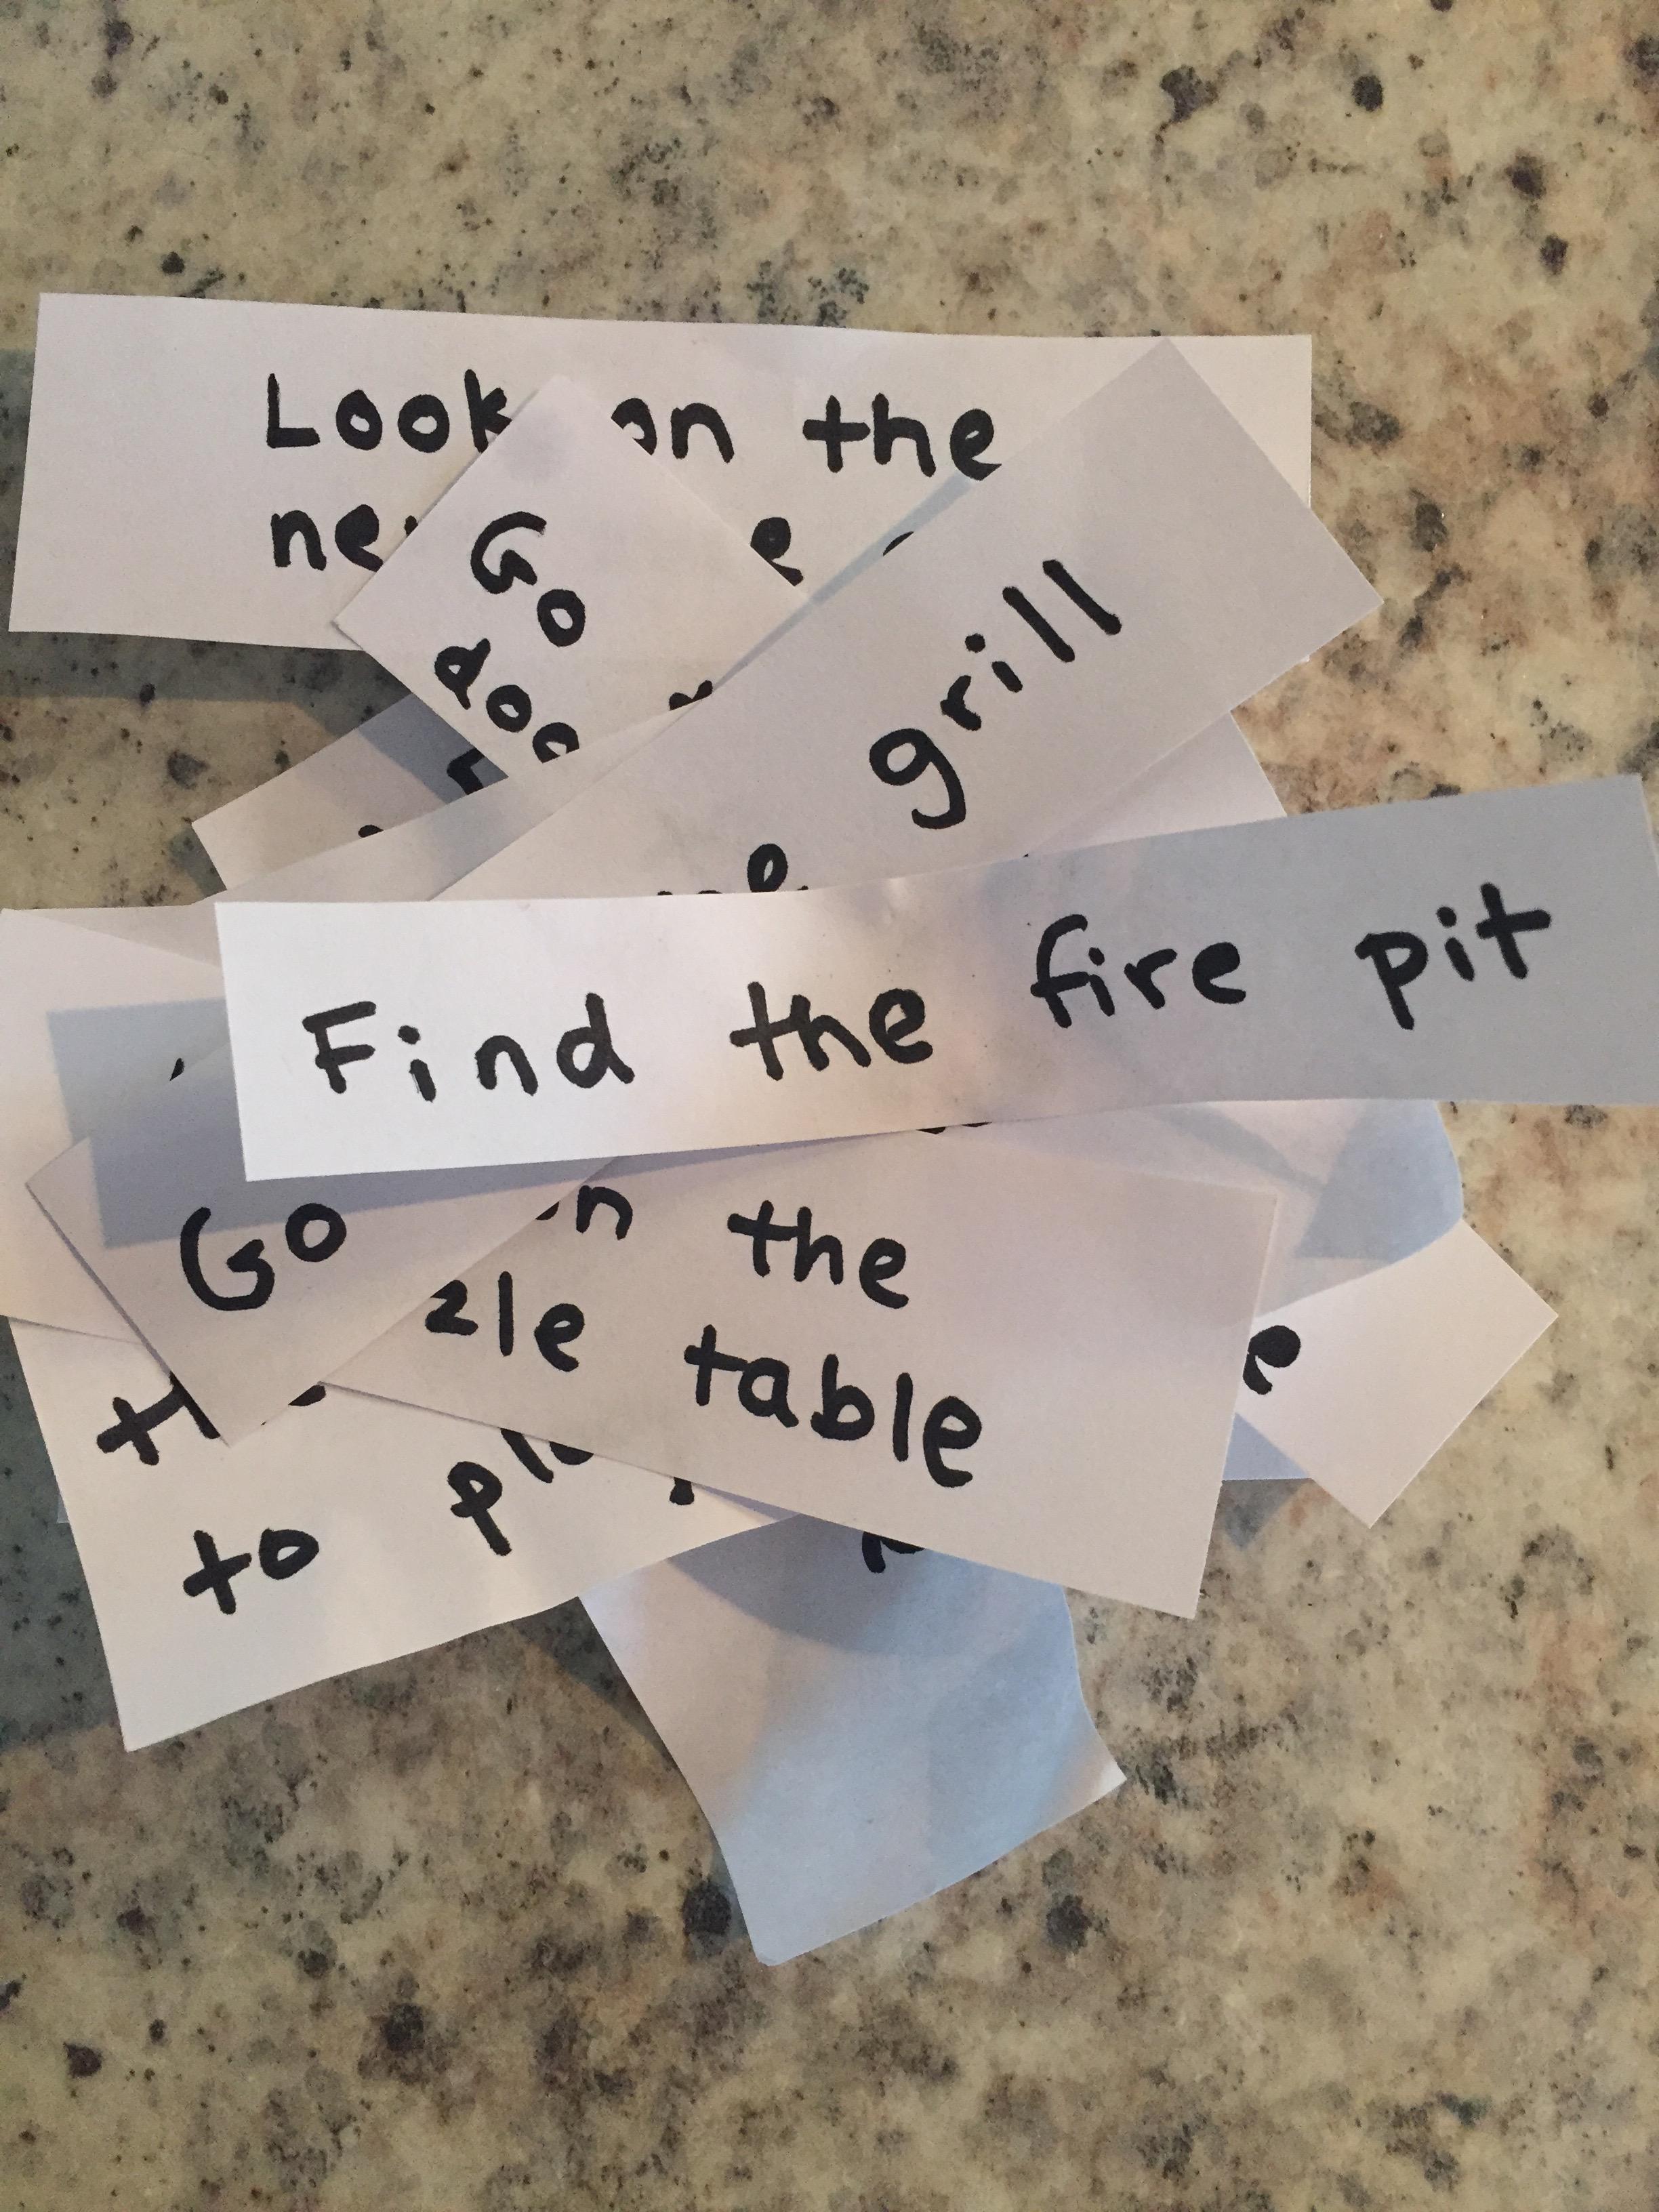 Clues for a kid-friendly  treasure hunt